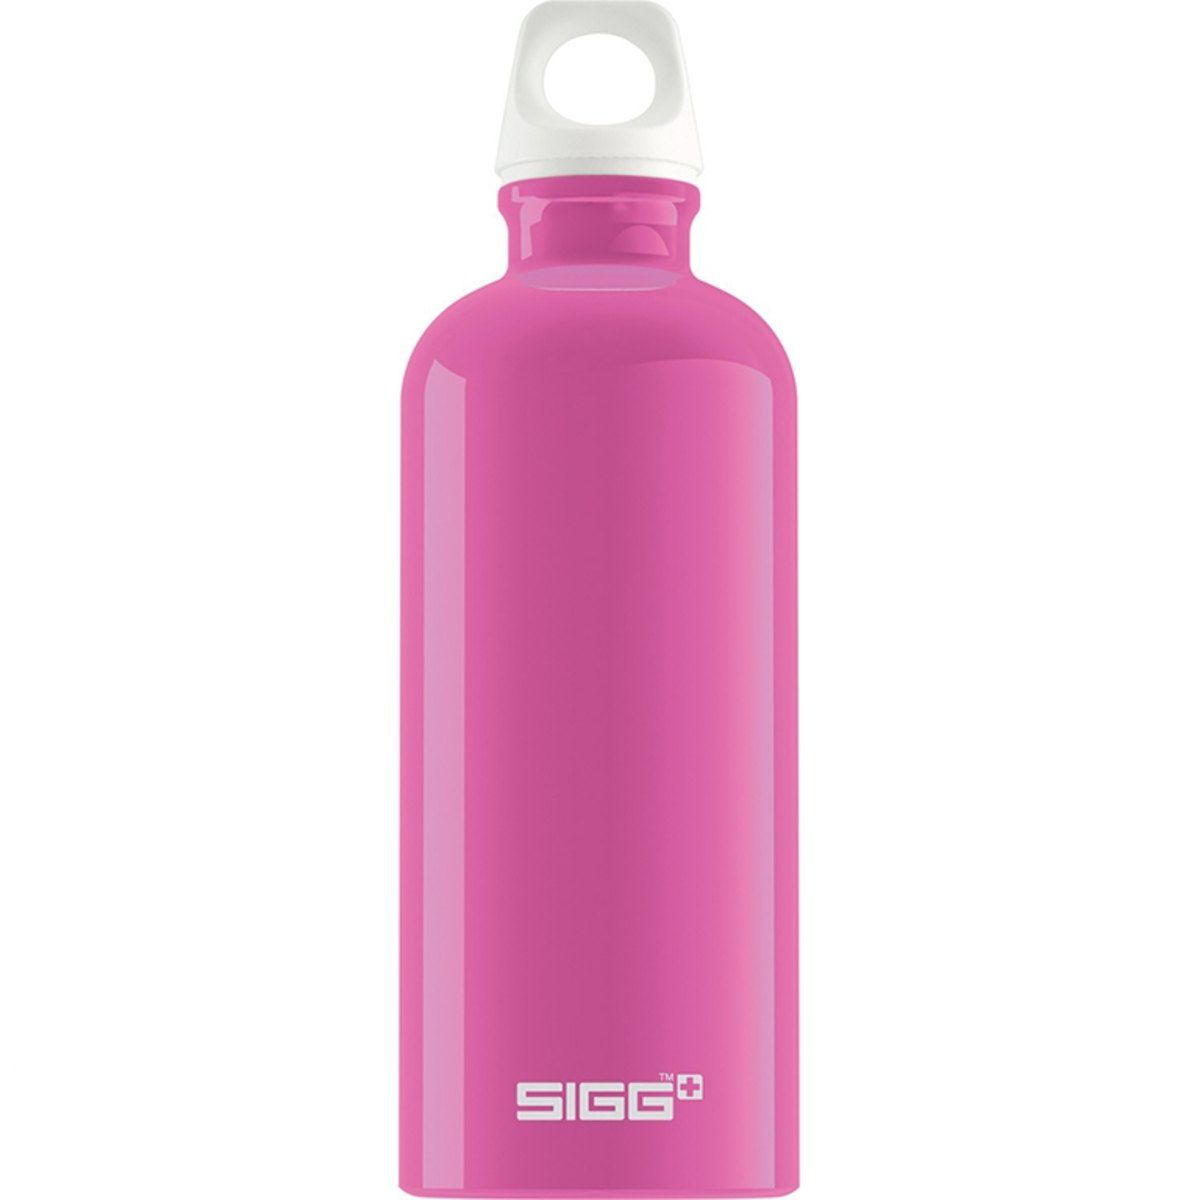 Garrafa Squeeze Fabulous - Sigg - 600ml - Pink